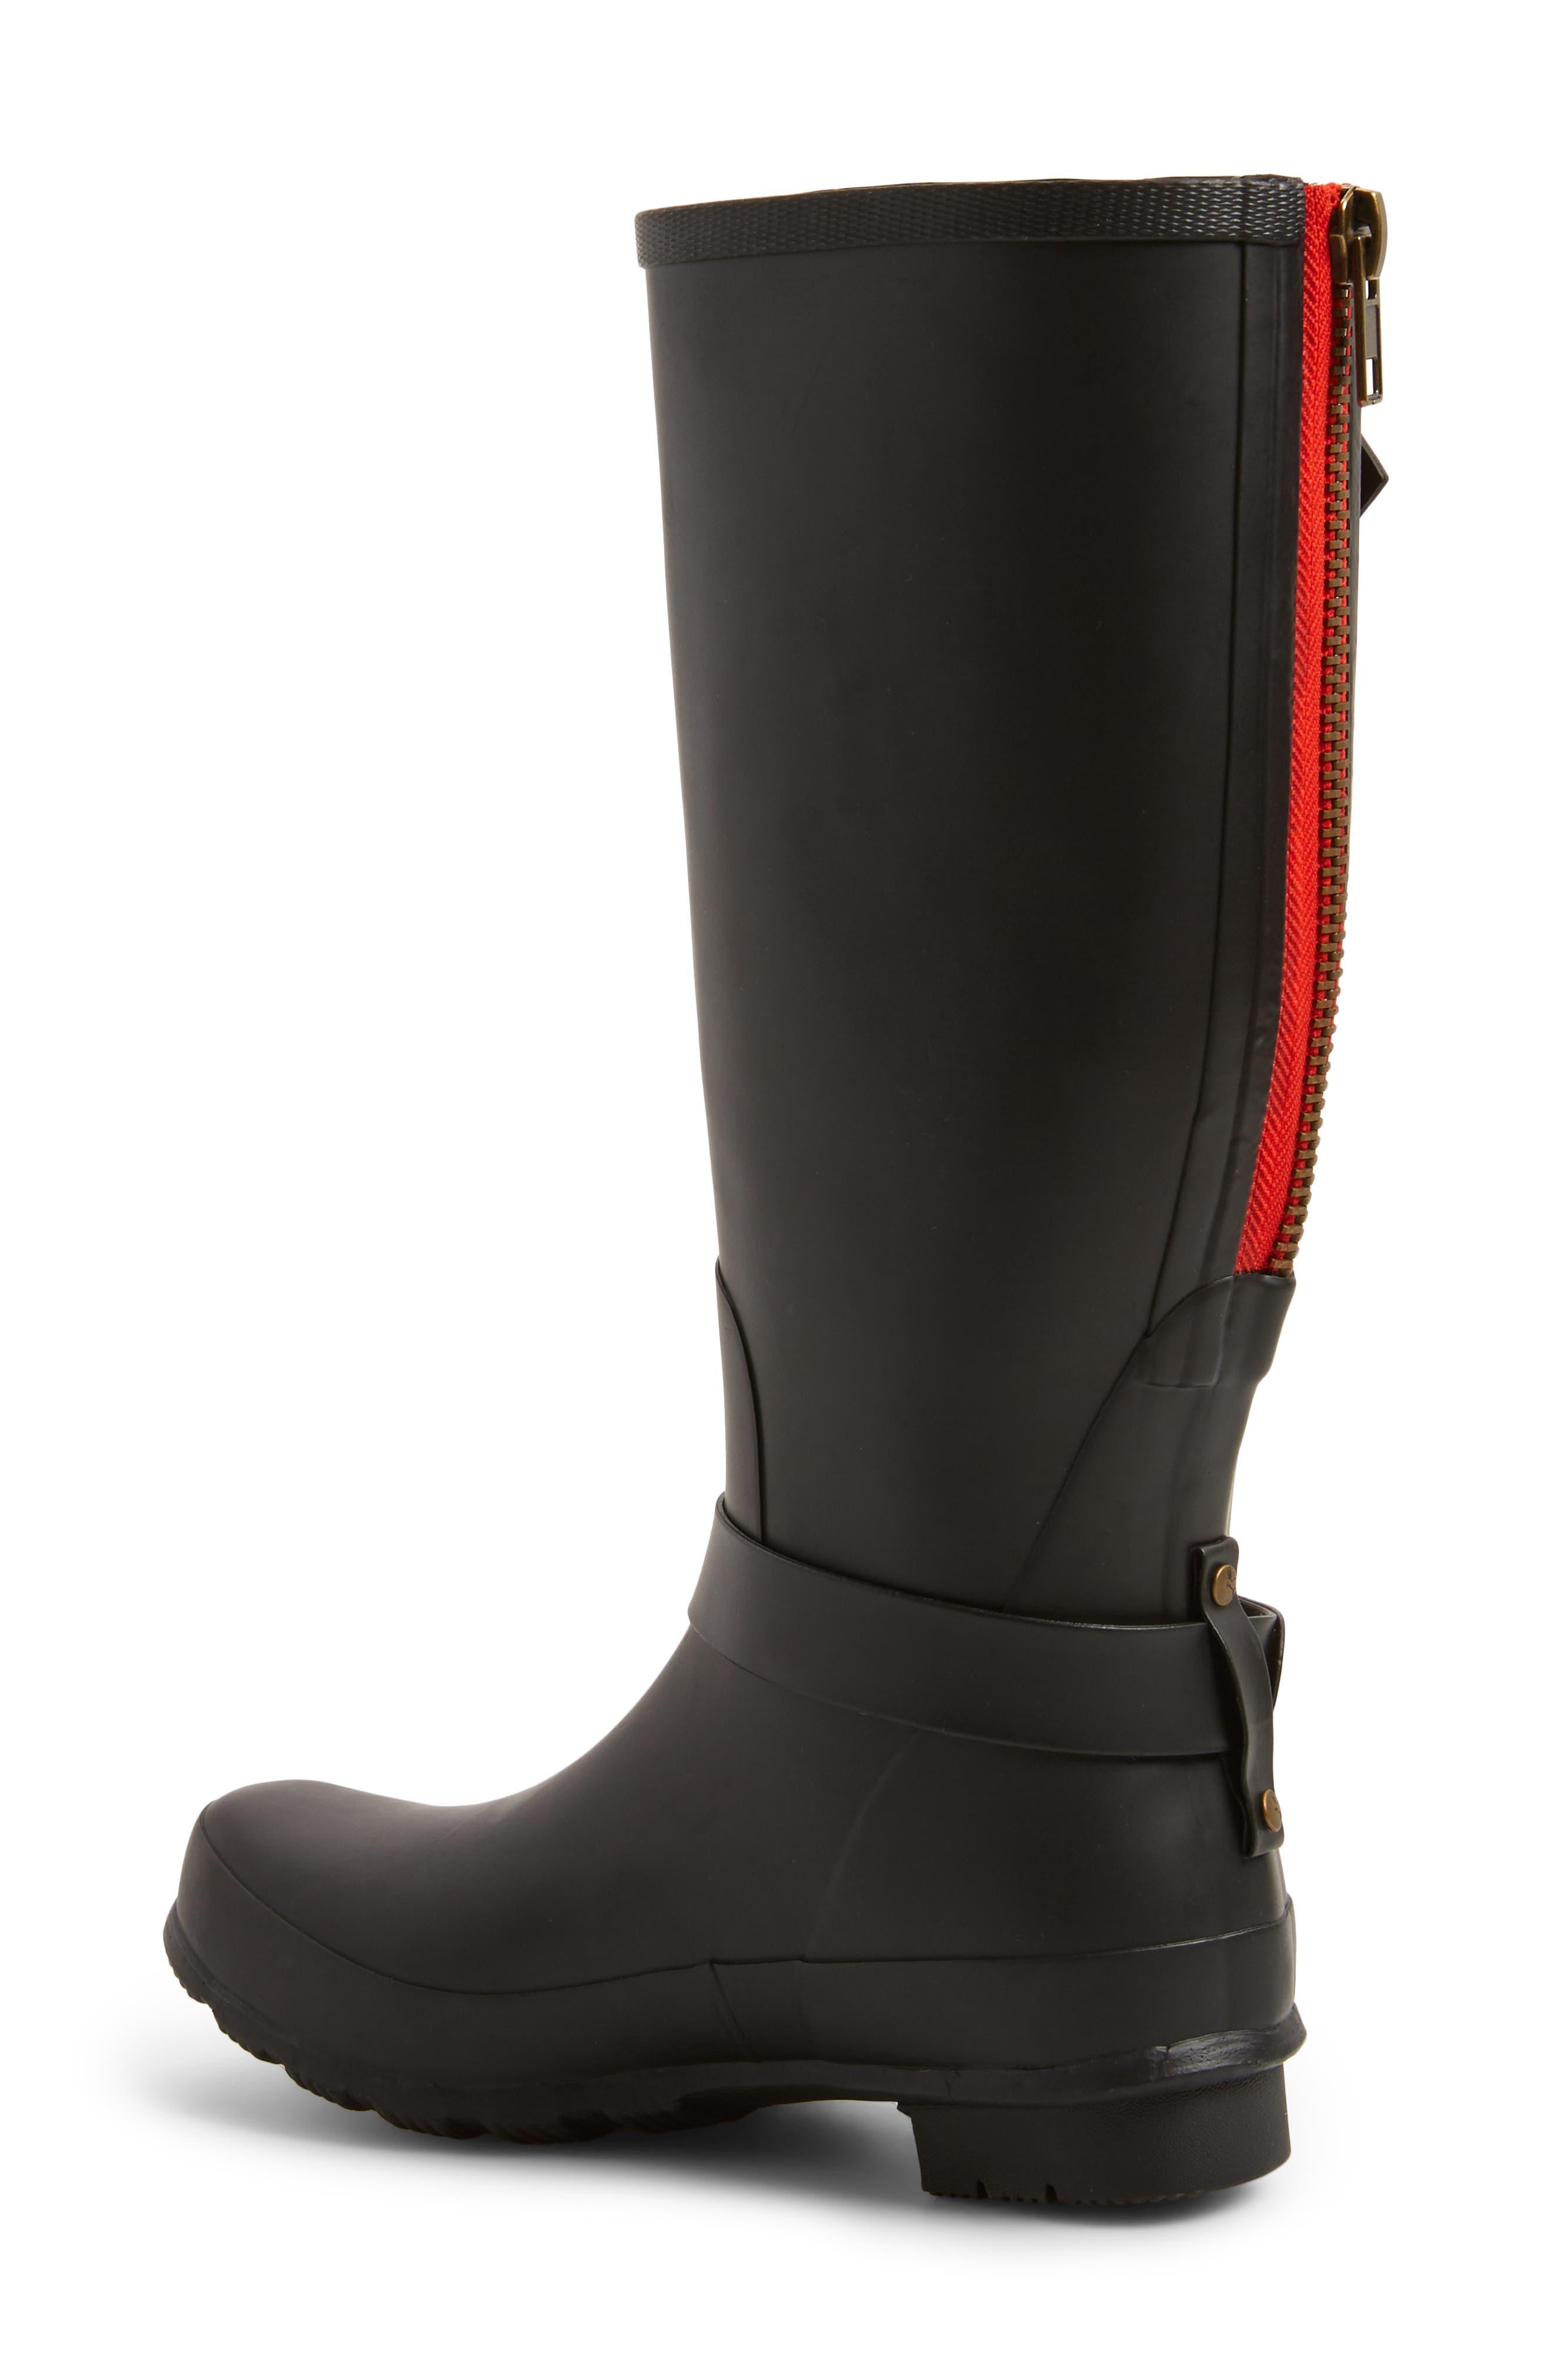 Biker Knee High Rain Boot,                             Alternate thumbnail 2, color,                             Black